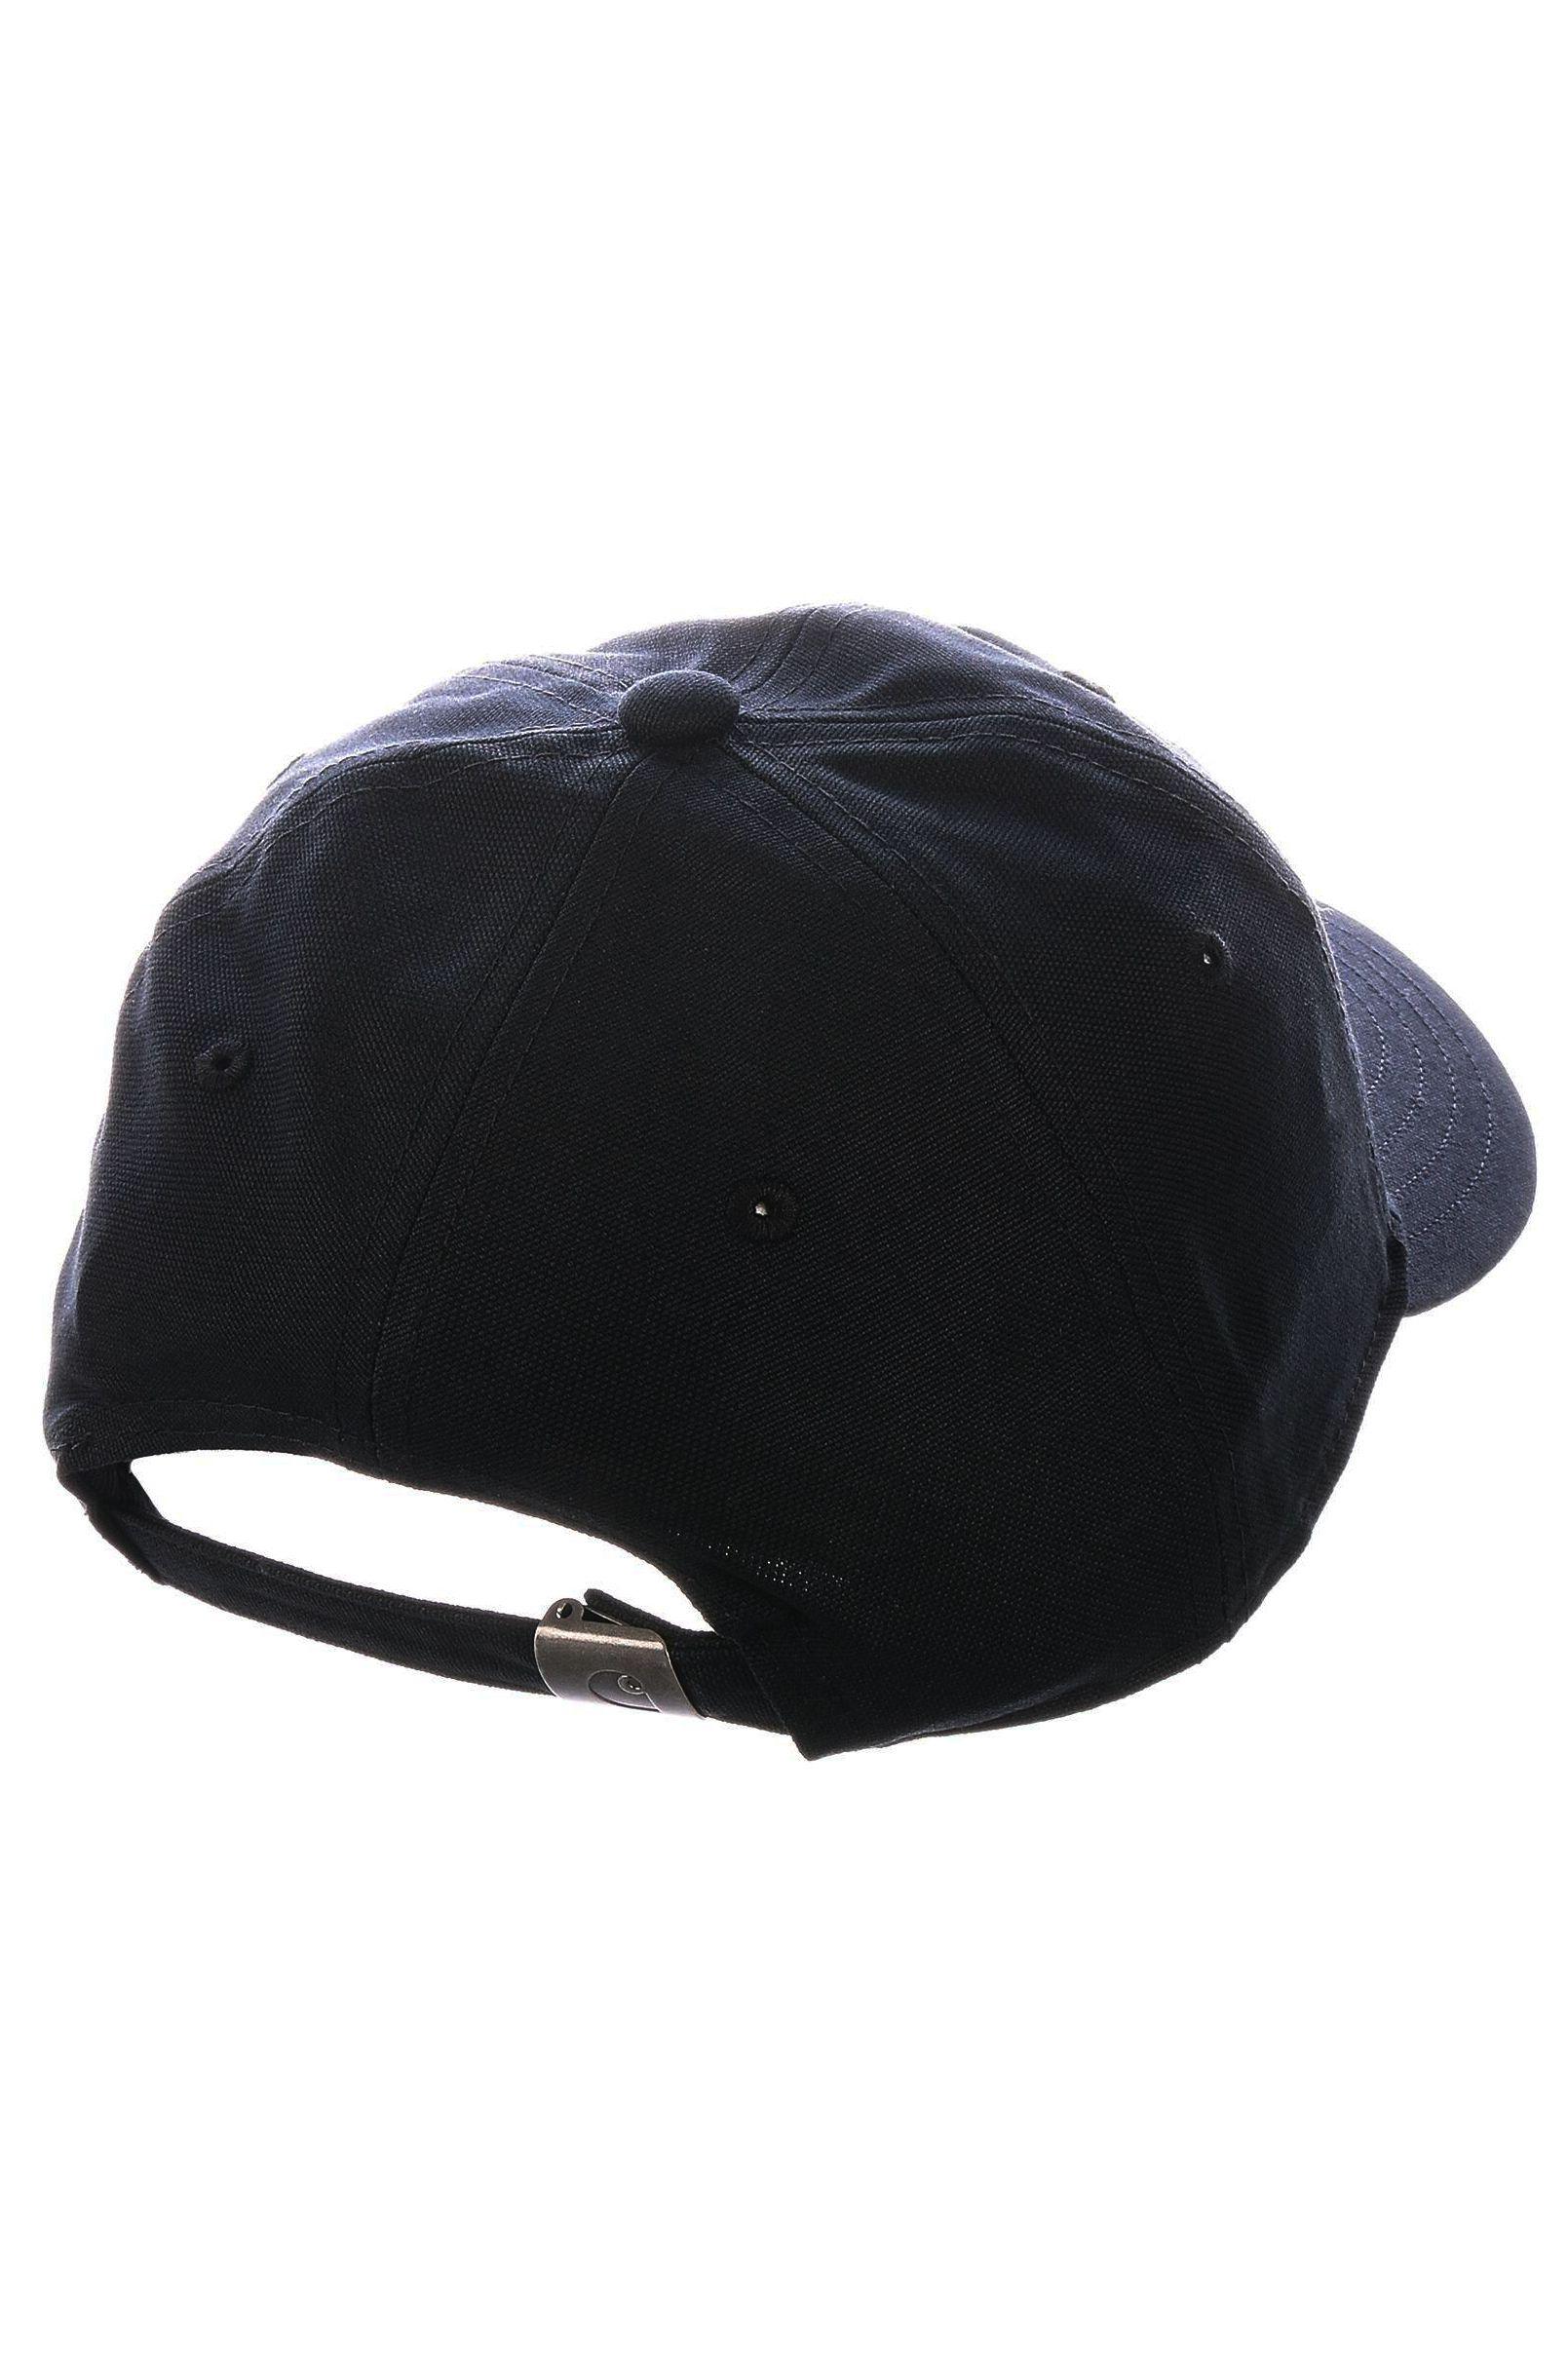 Bone Carhartt WIP CANVAS SCRIPT CAP Black/White